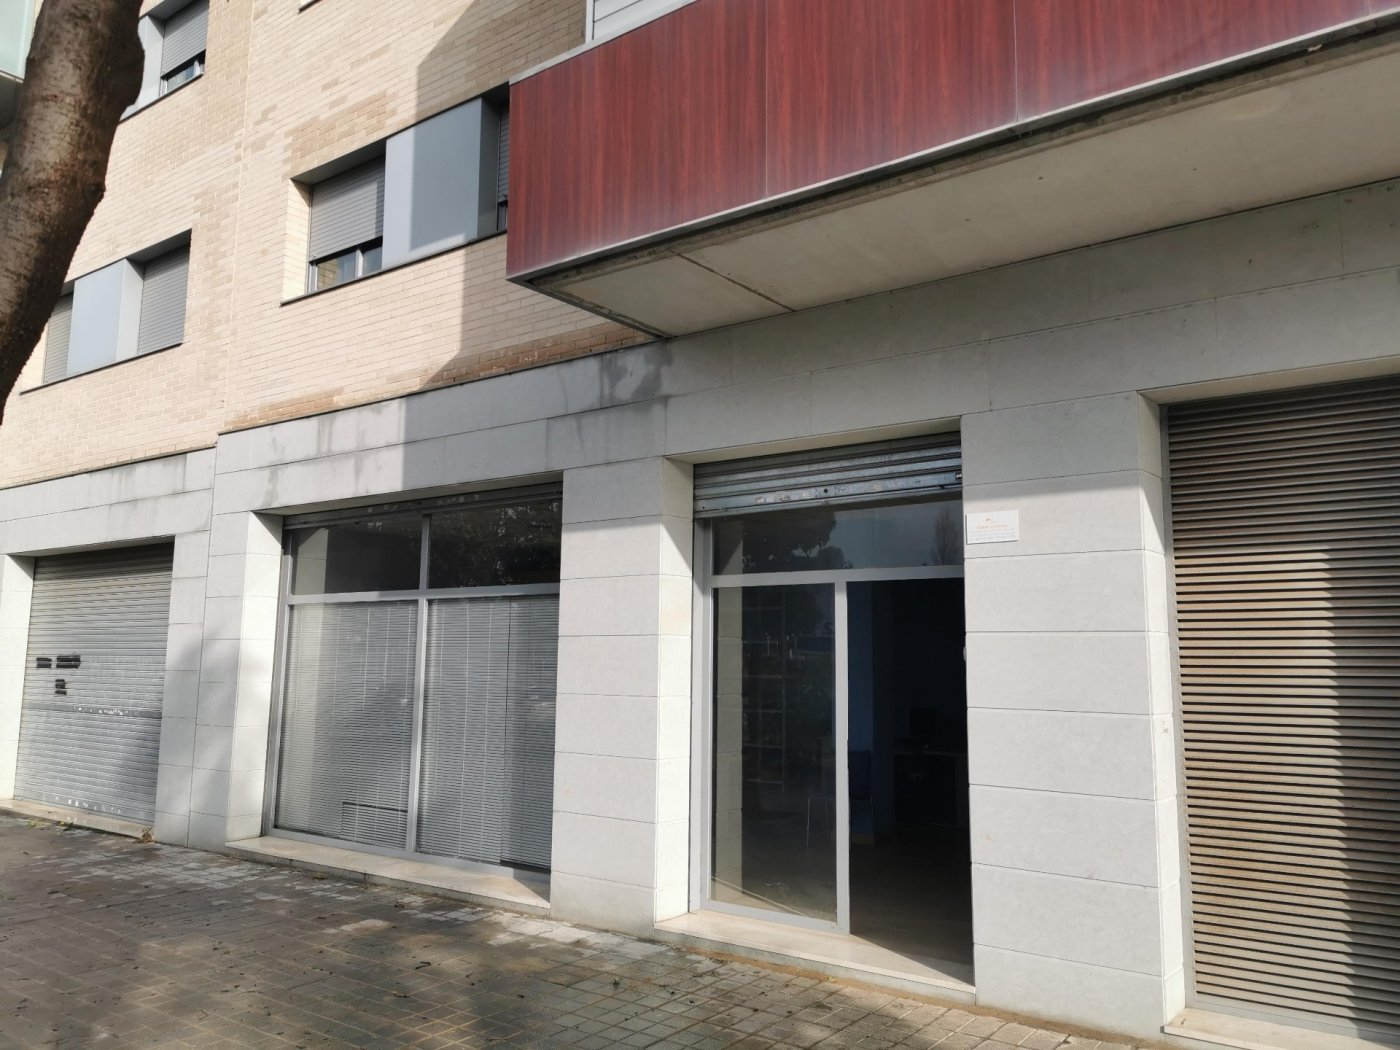 Premises for sale in Alcalde Joan Beltran, Reus